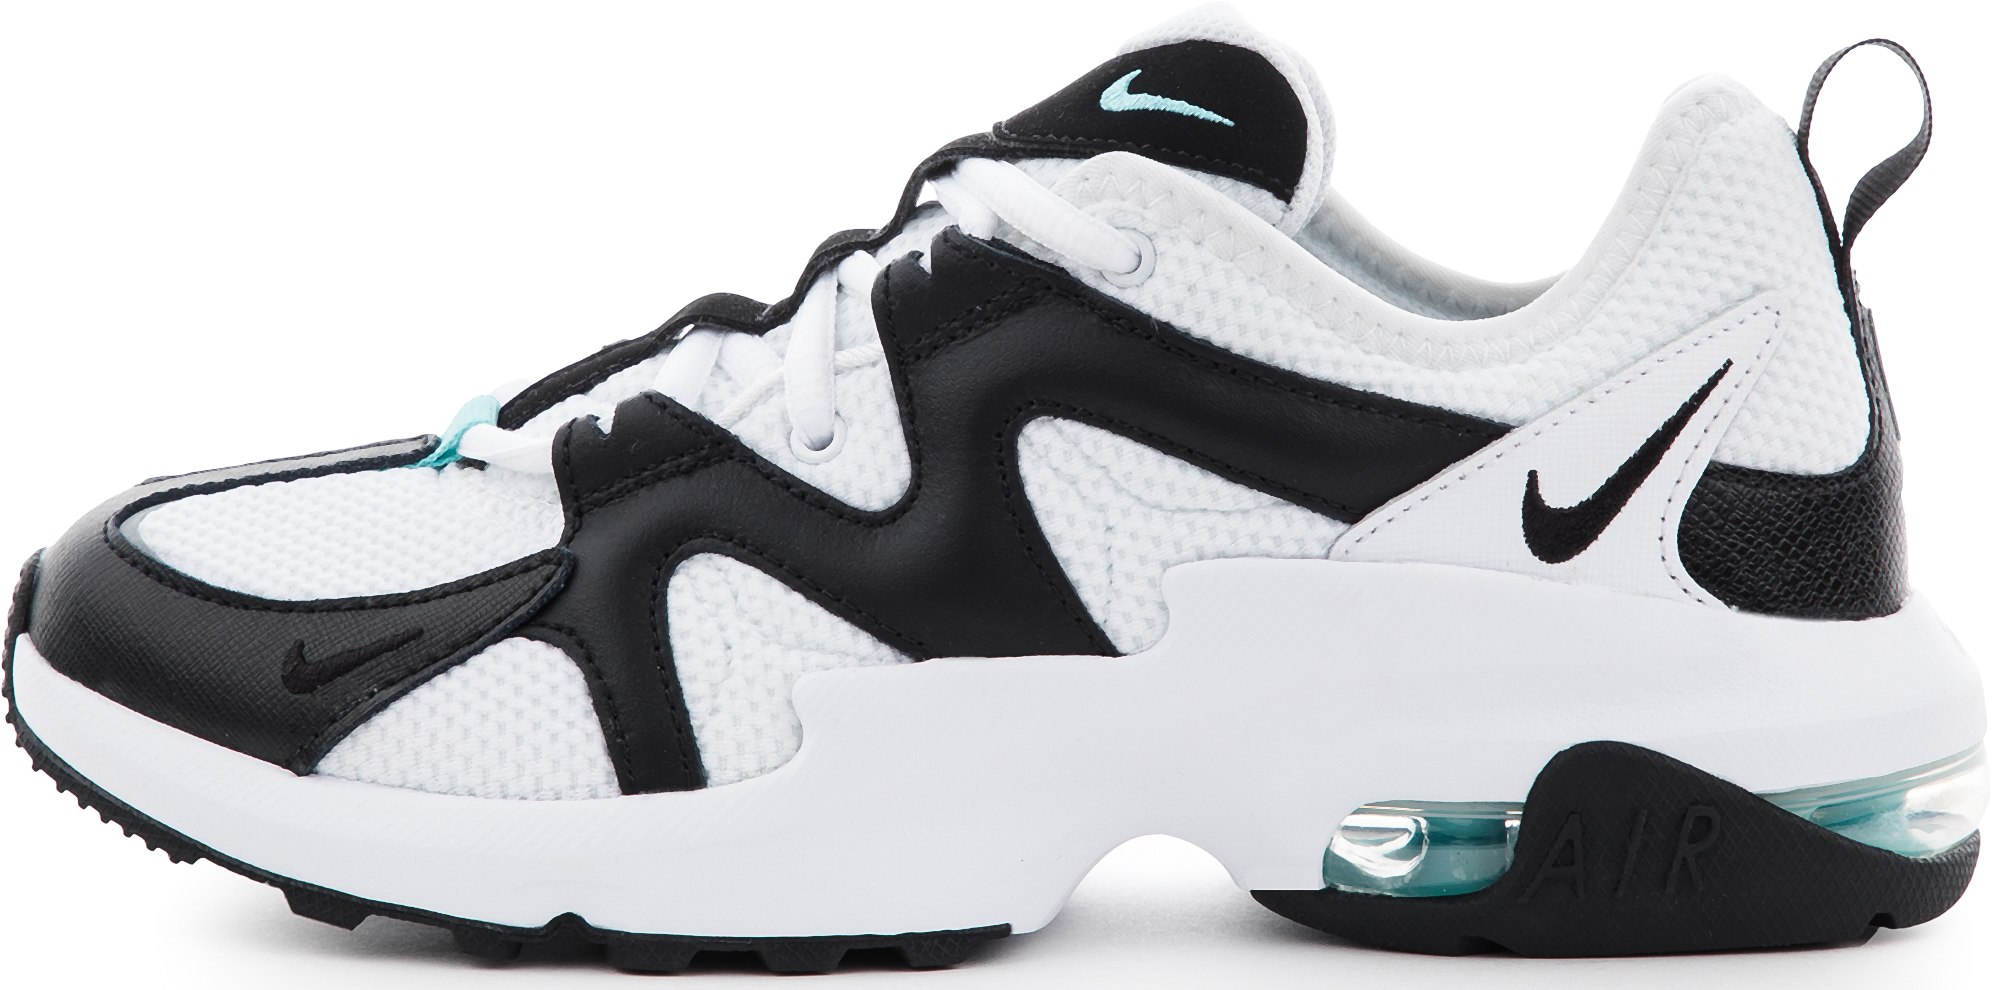 Nike Кроссовки женские Air Max Graviton, размер 39